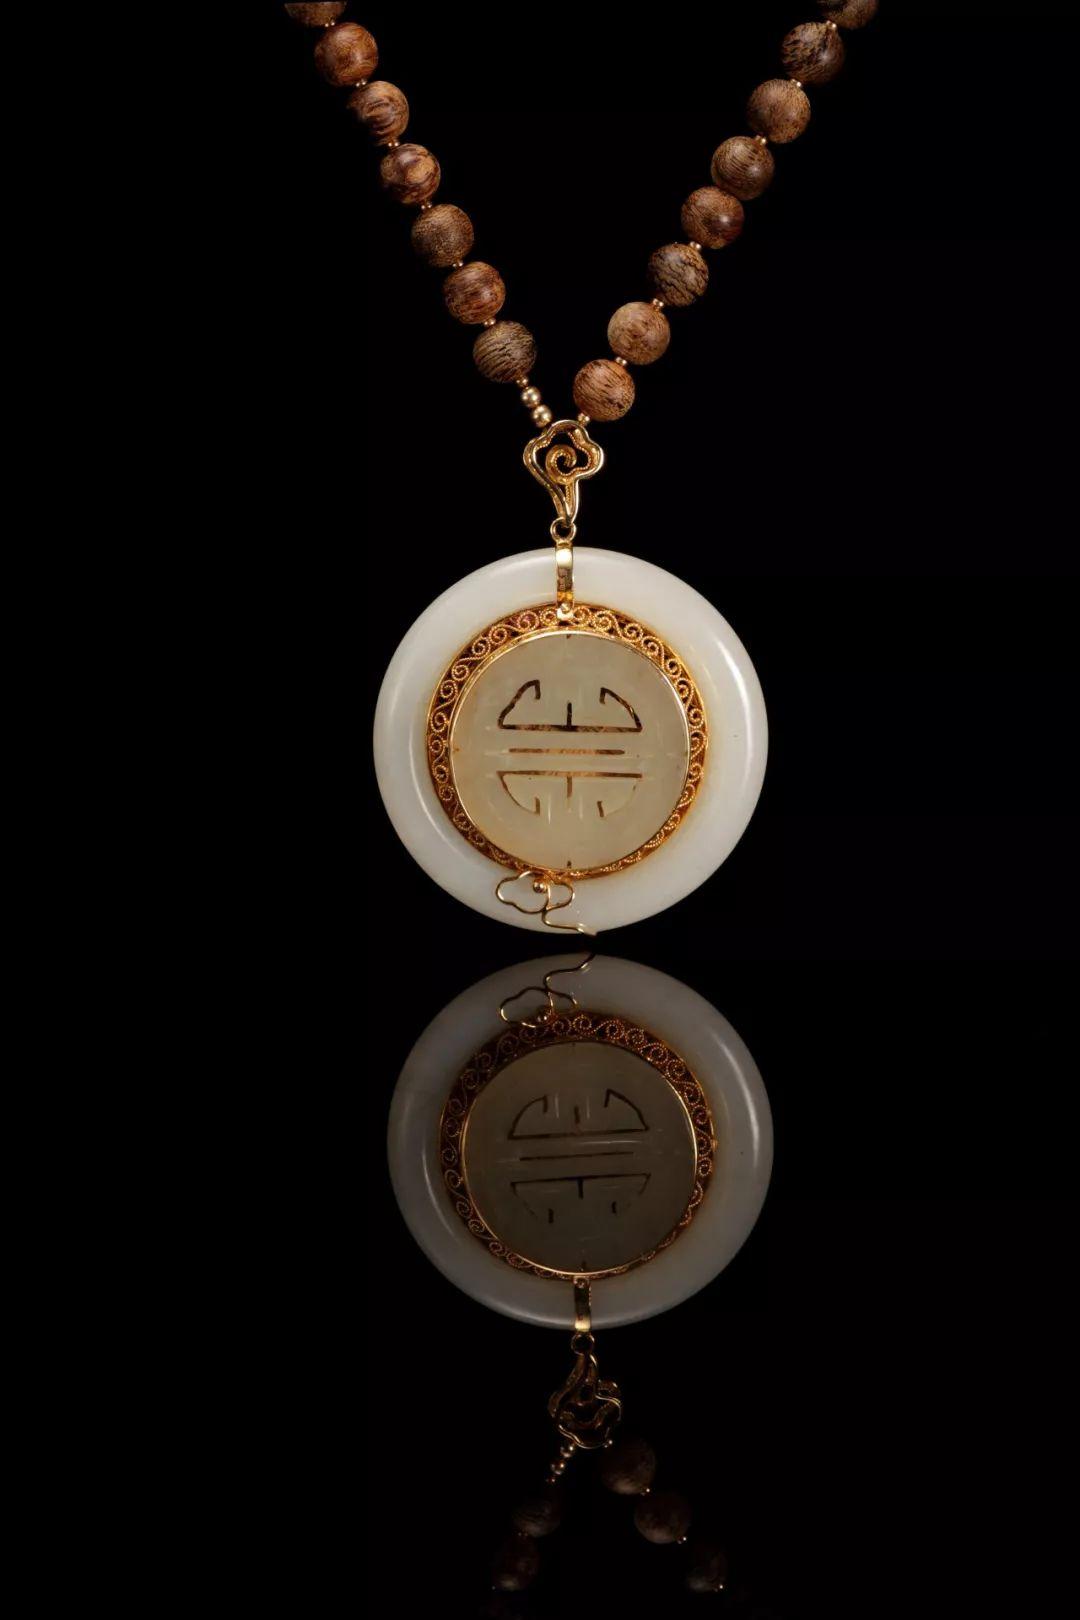 GAC独立首饰亚洲城ca272联展 珠宝制作工艺